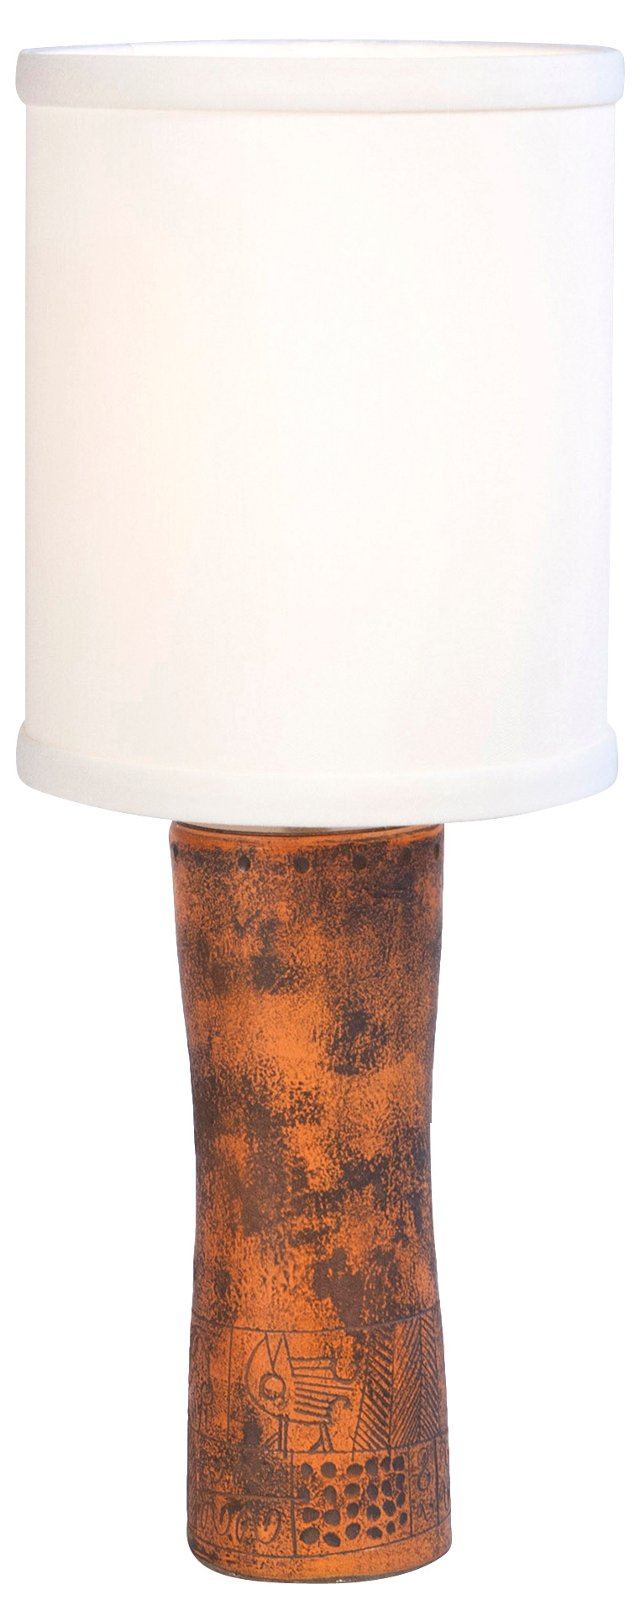 Jacques Blin Ceramic Lamp